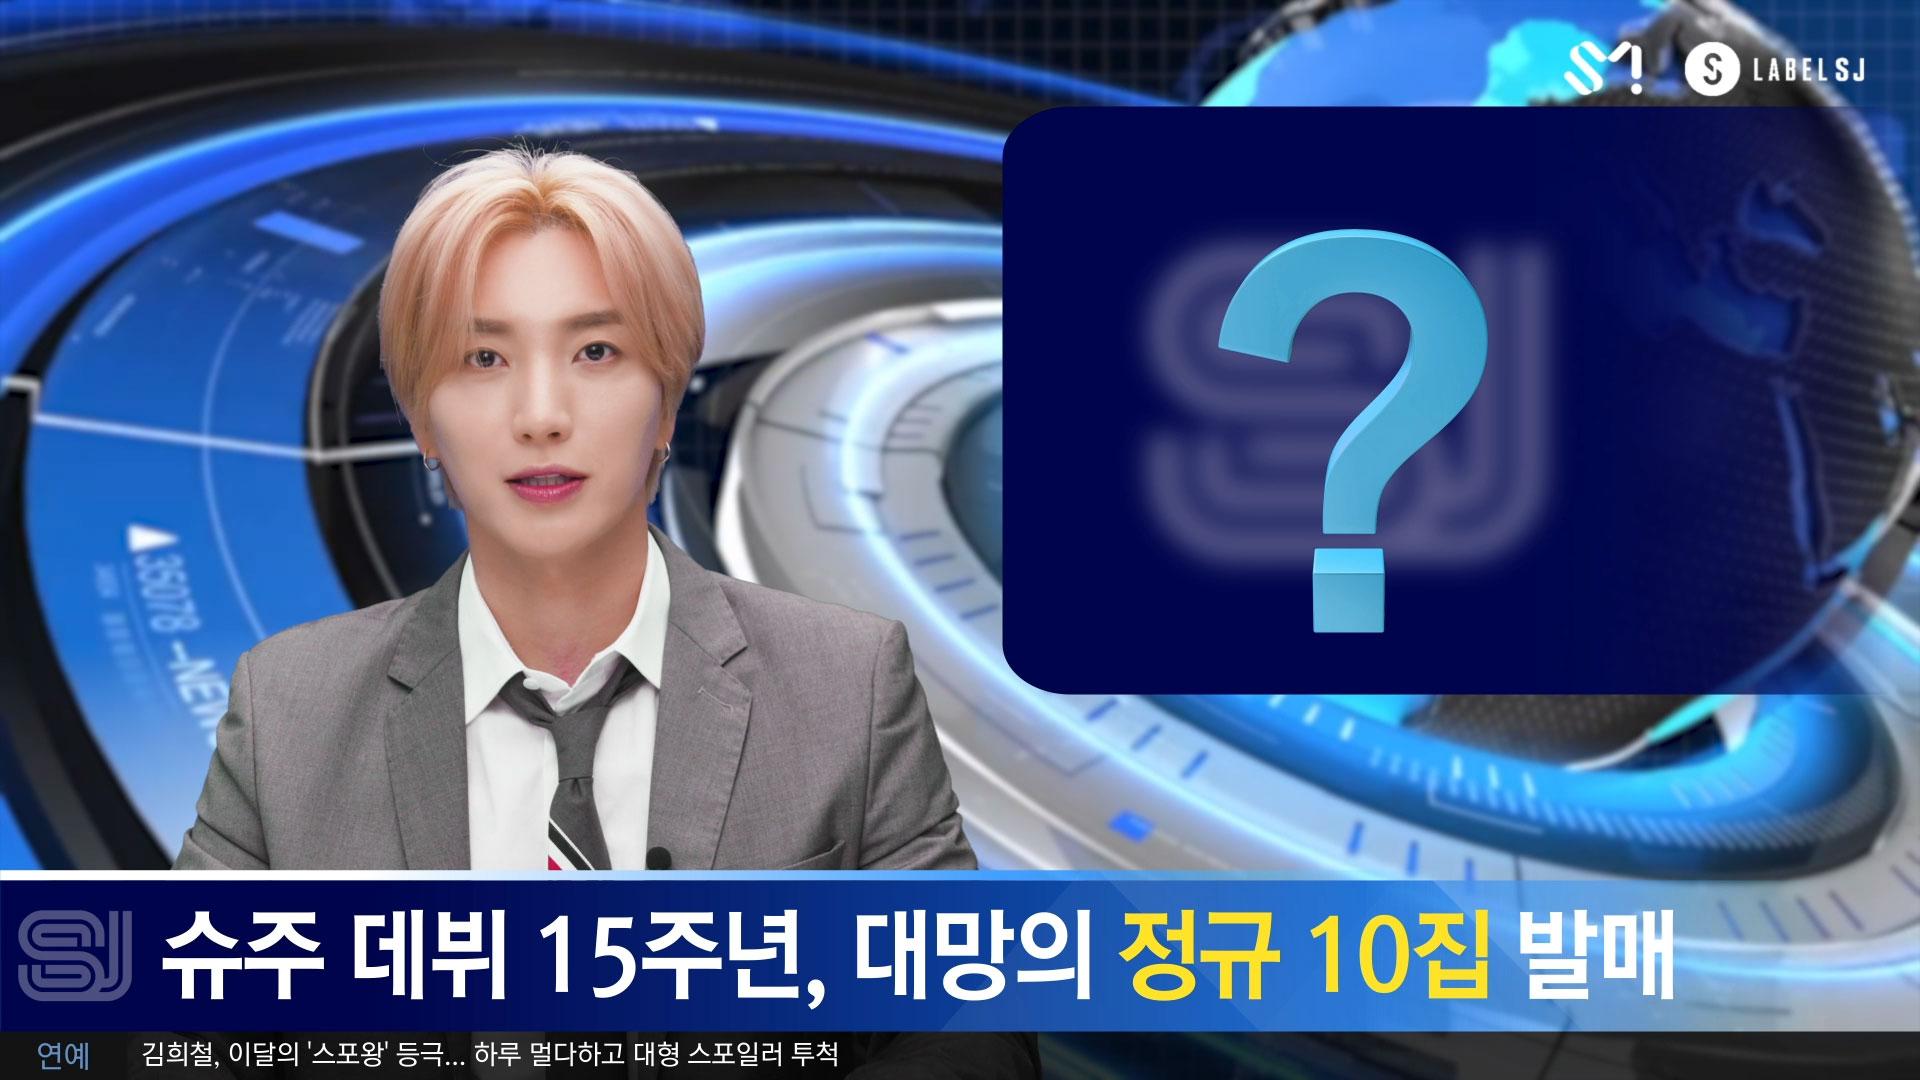 [SJ NEWS Ep.1] 슈주 뉴스 1회